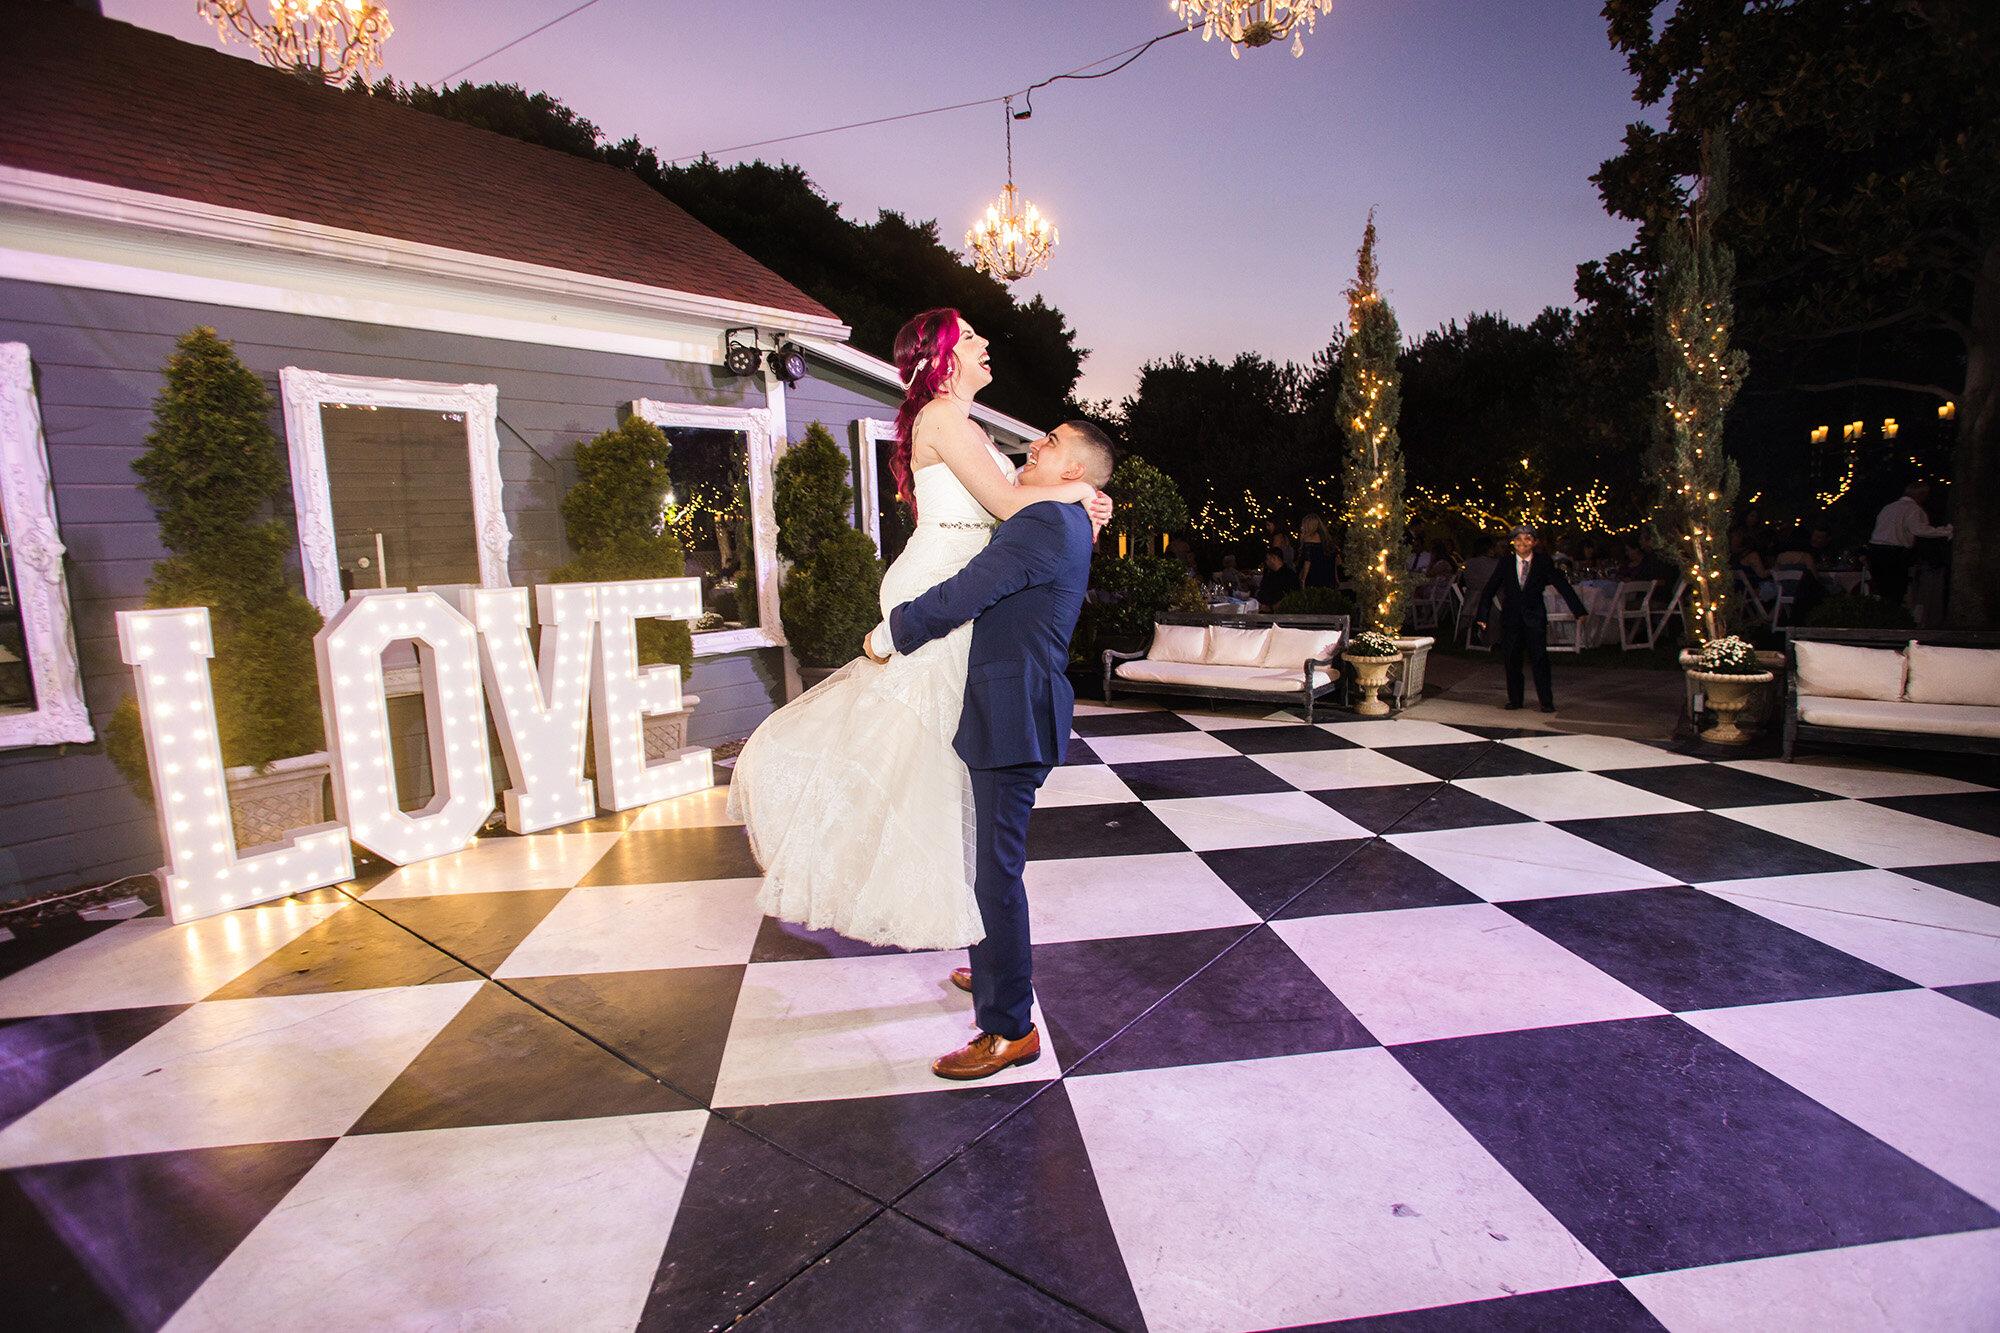 crazy-funchristmas-house-wedding-carrie-vines-013.jpg